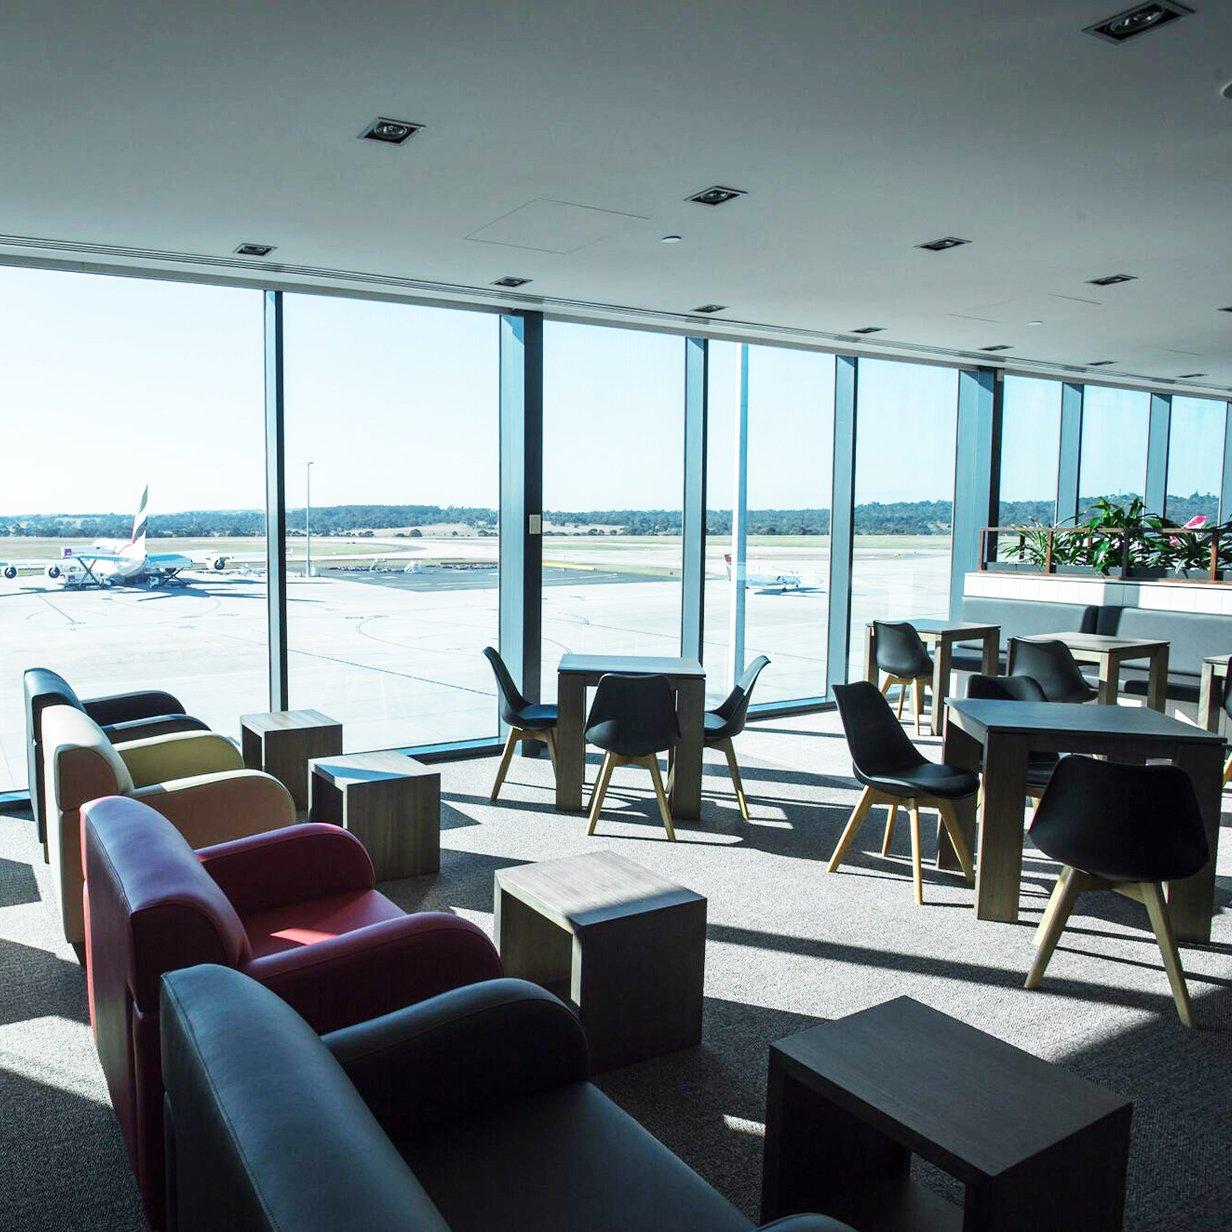 Melbourne Airport Lounge Access   Australia   marhaba Services